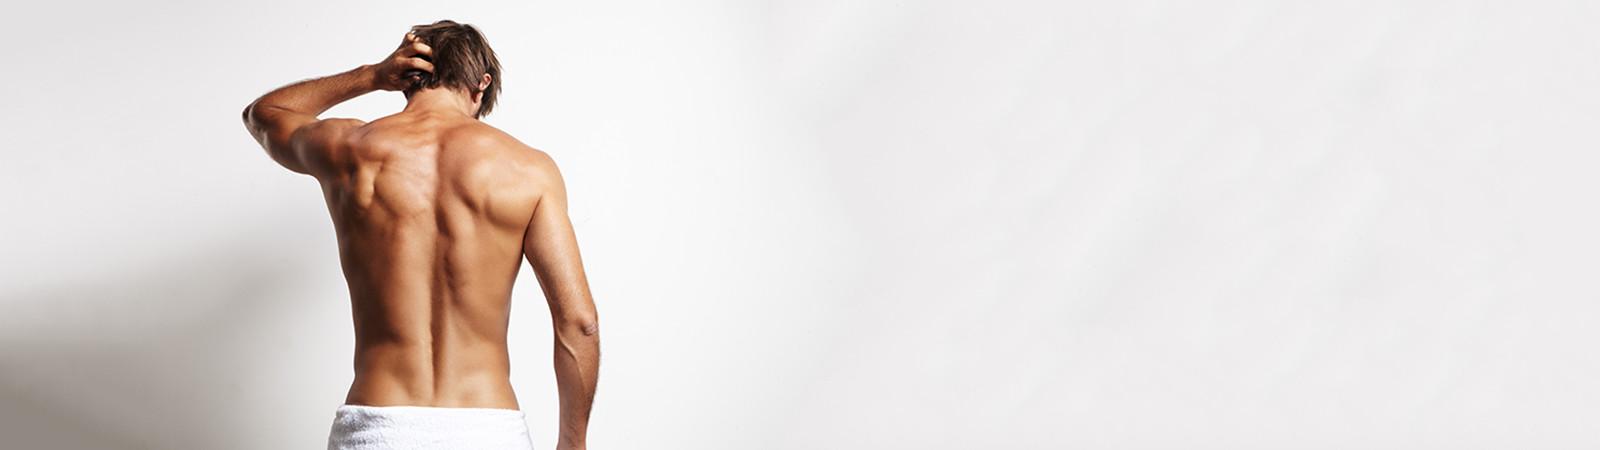 Fettabsaugung bei Männern - Dr. Armin Rau